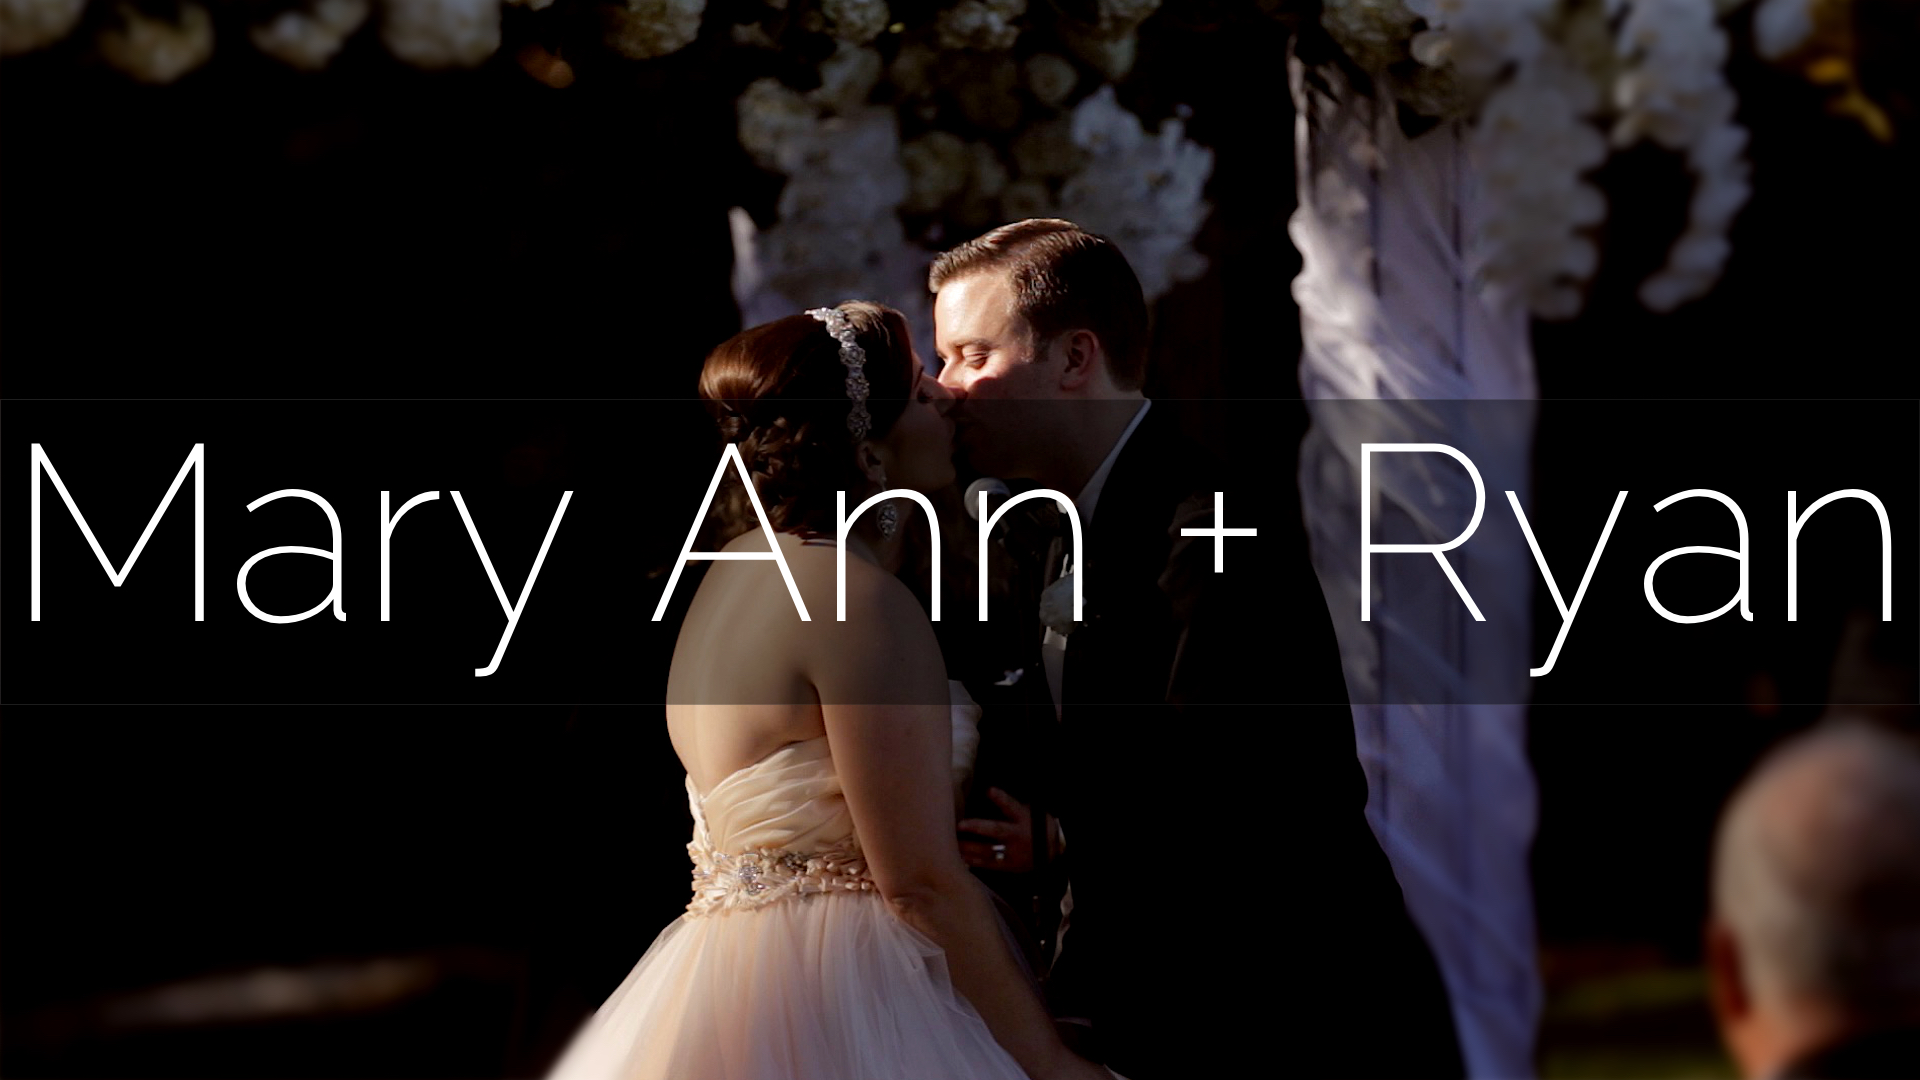 Mary-Ann-Ryan-Blog-Cver.jpg